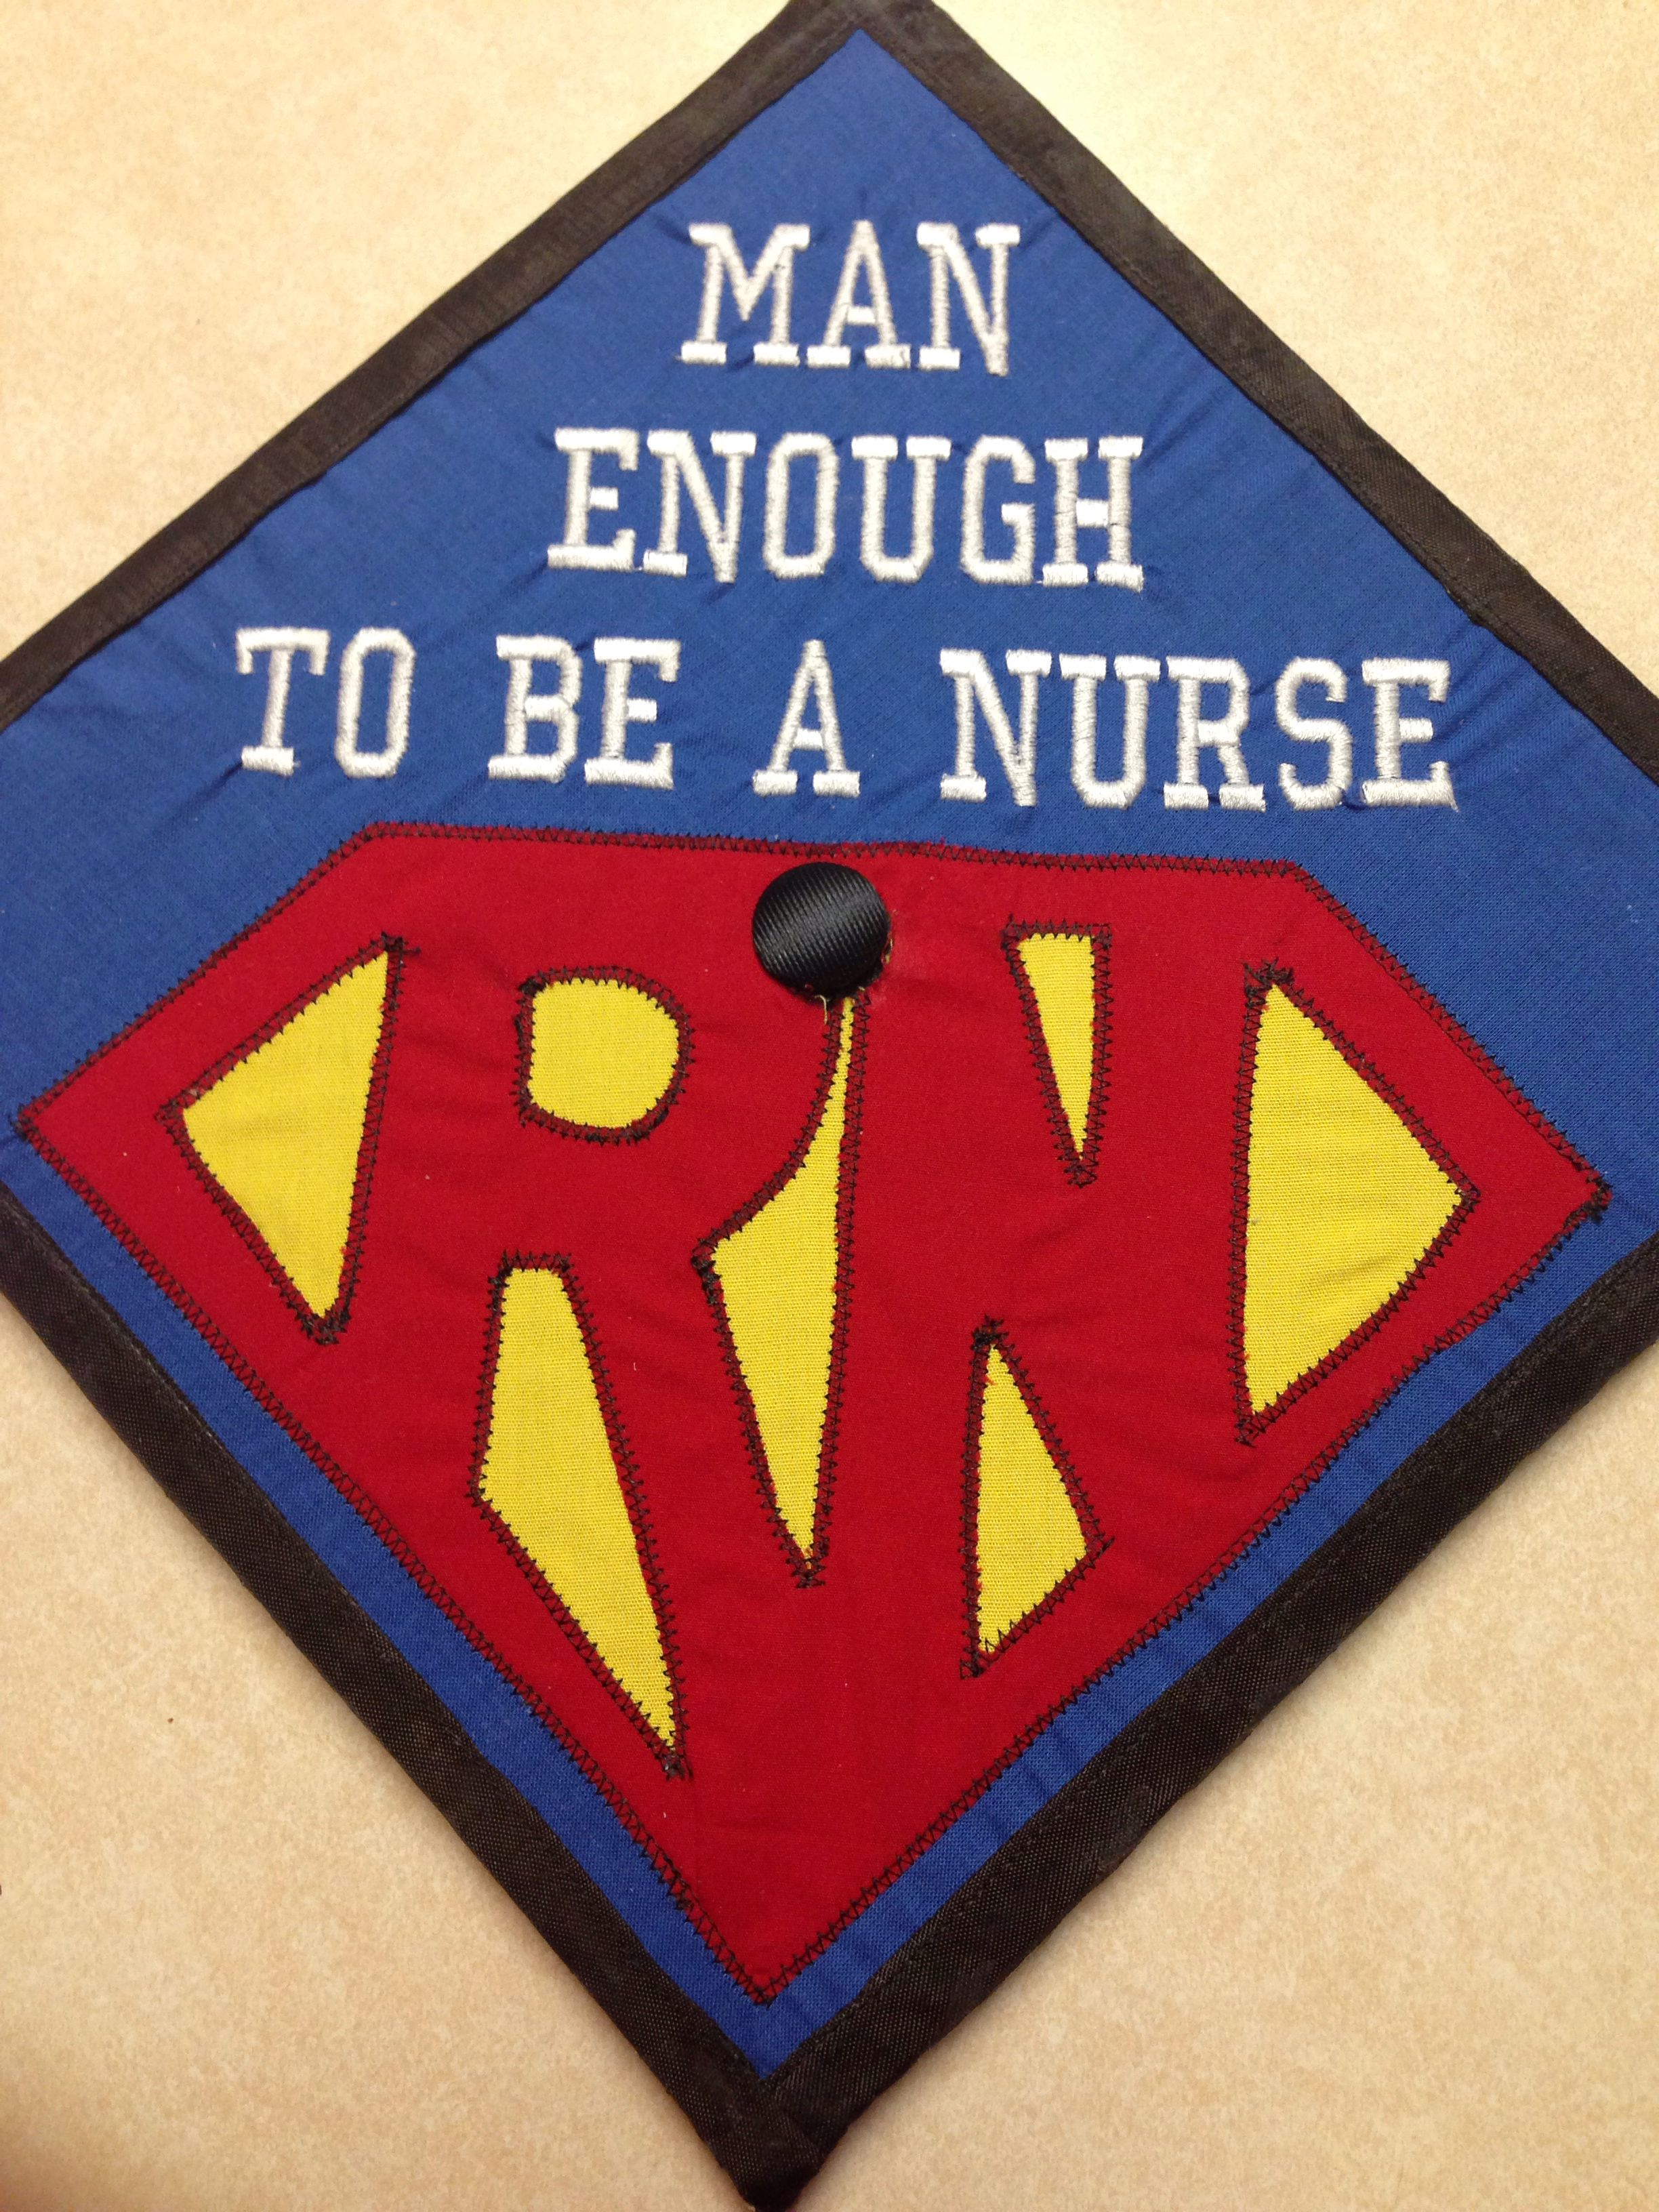 Pin By Shelley Brauer On Nursing Nurse Graduation Cap Medical School Graduation Gift Medical School Graduation